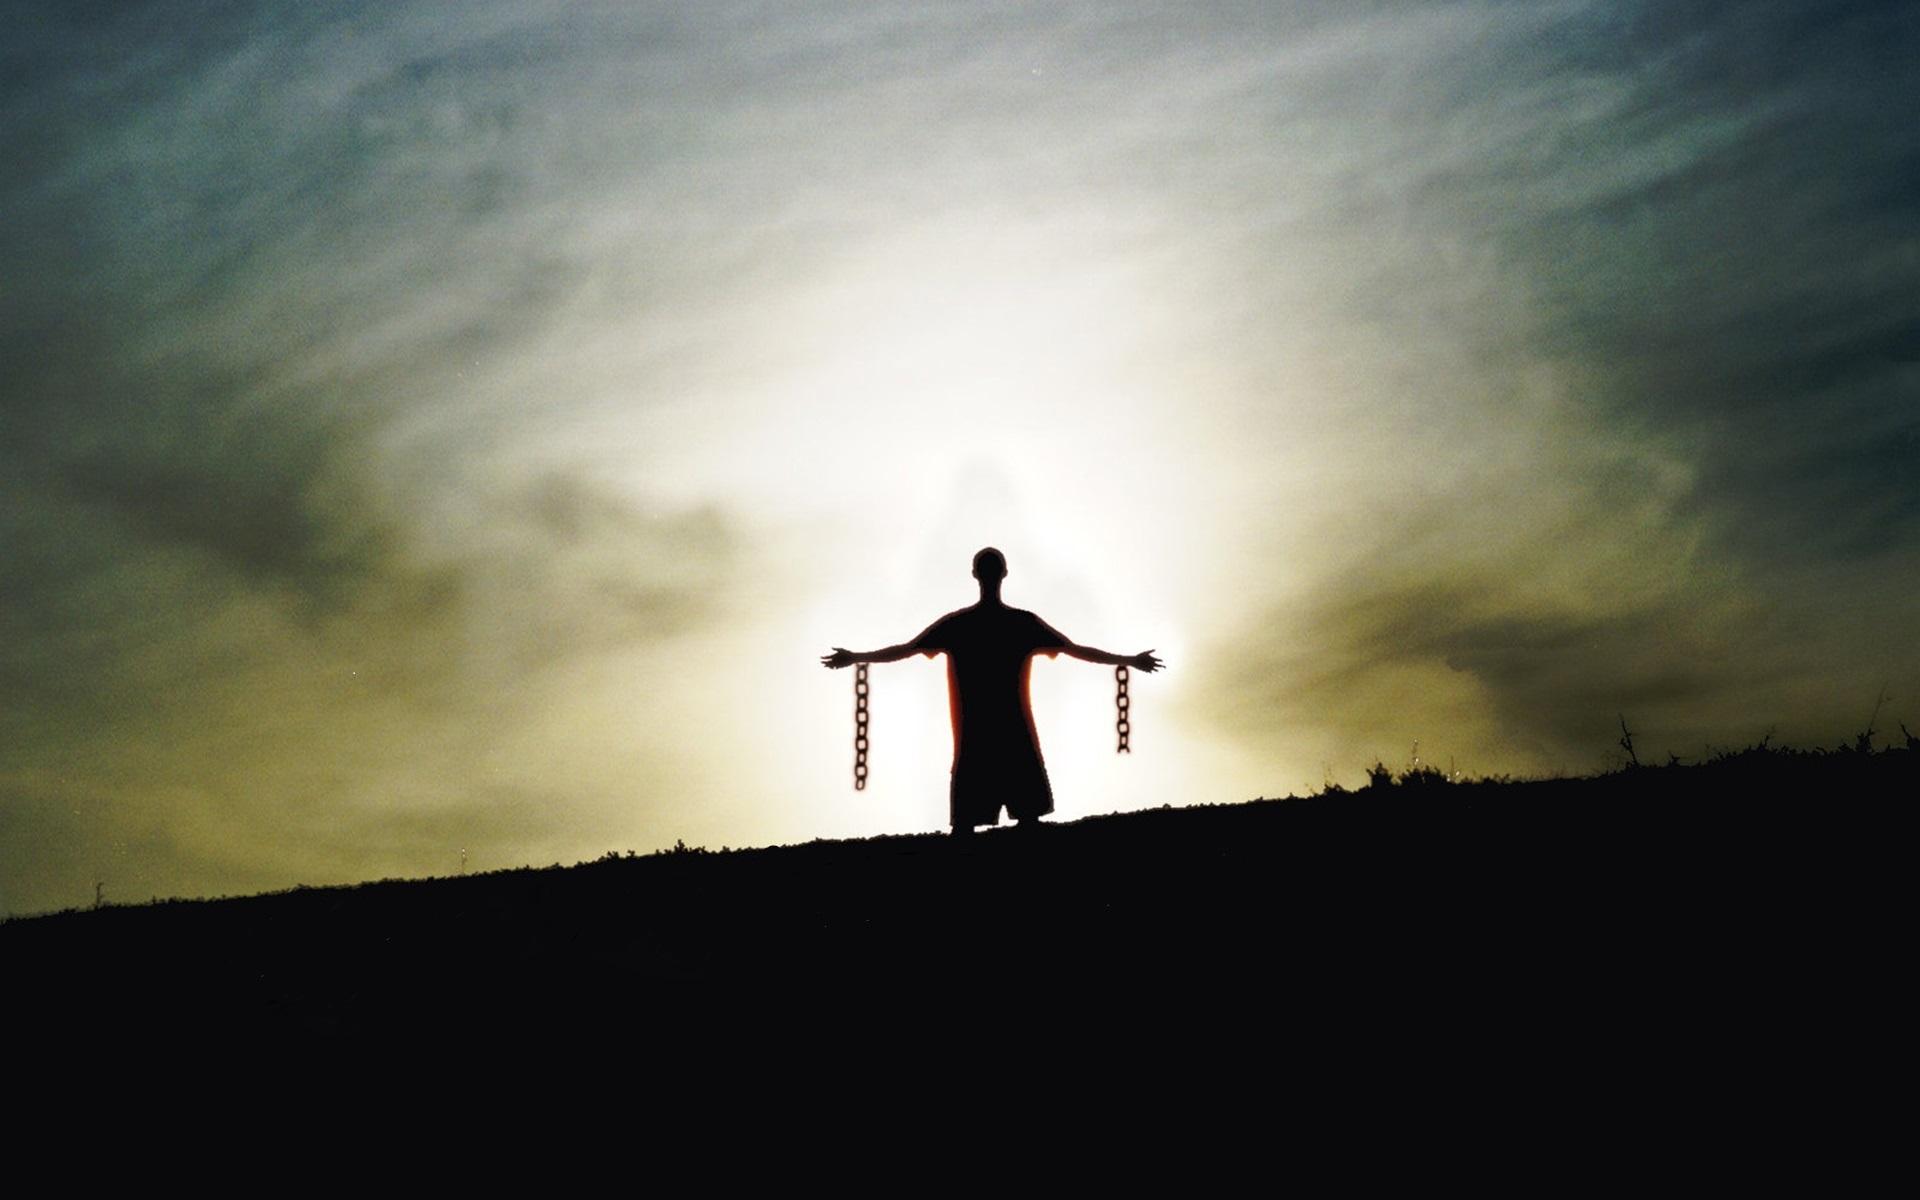 A Verdadeira liberdade eterna